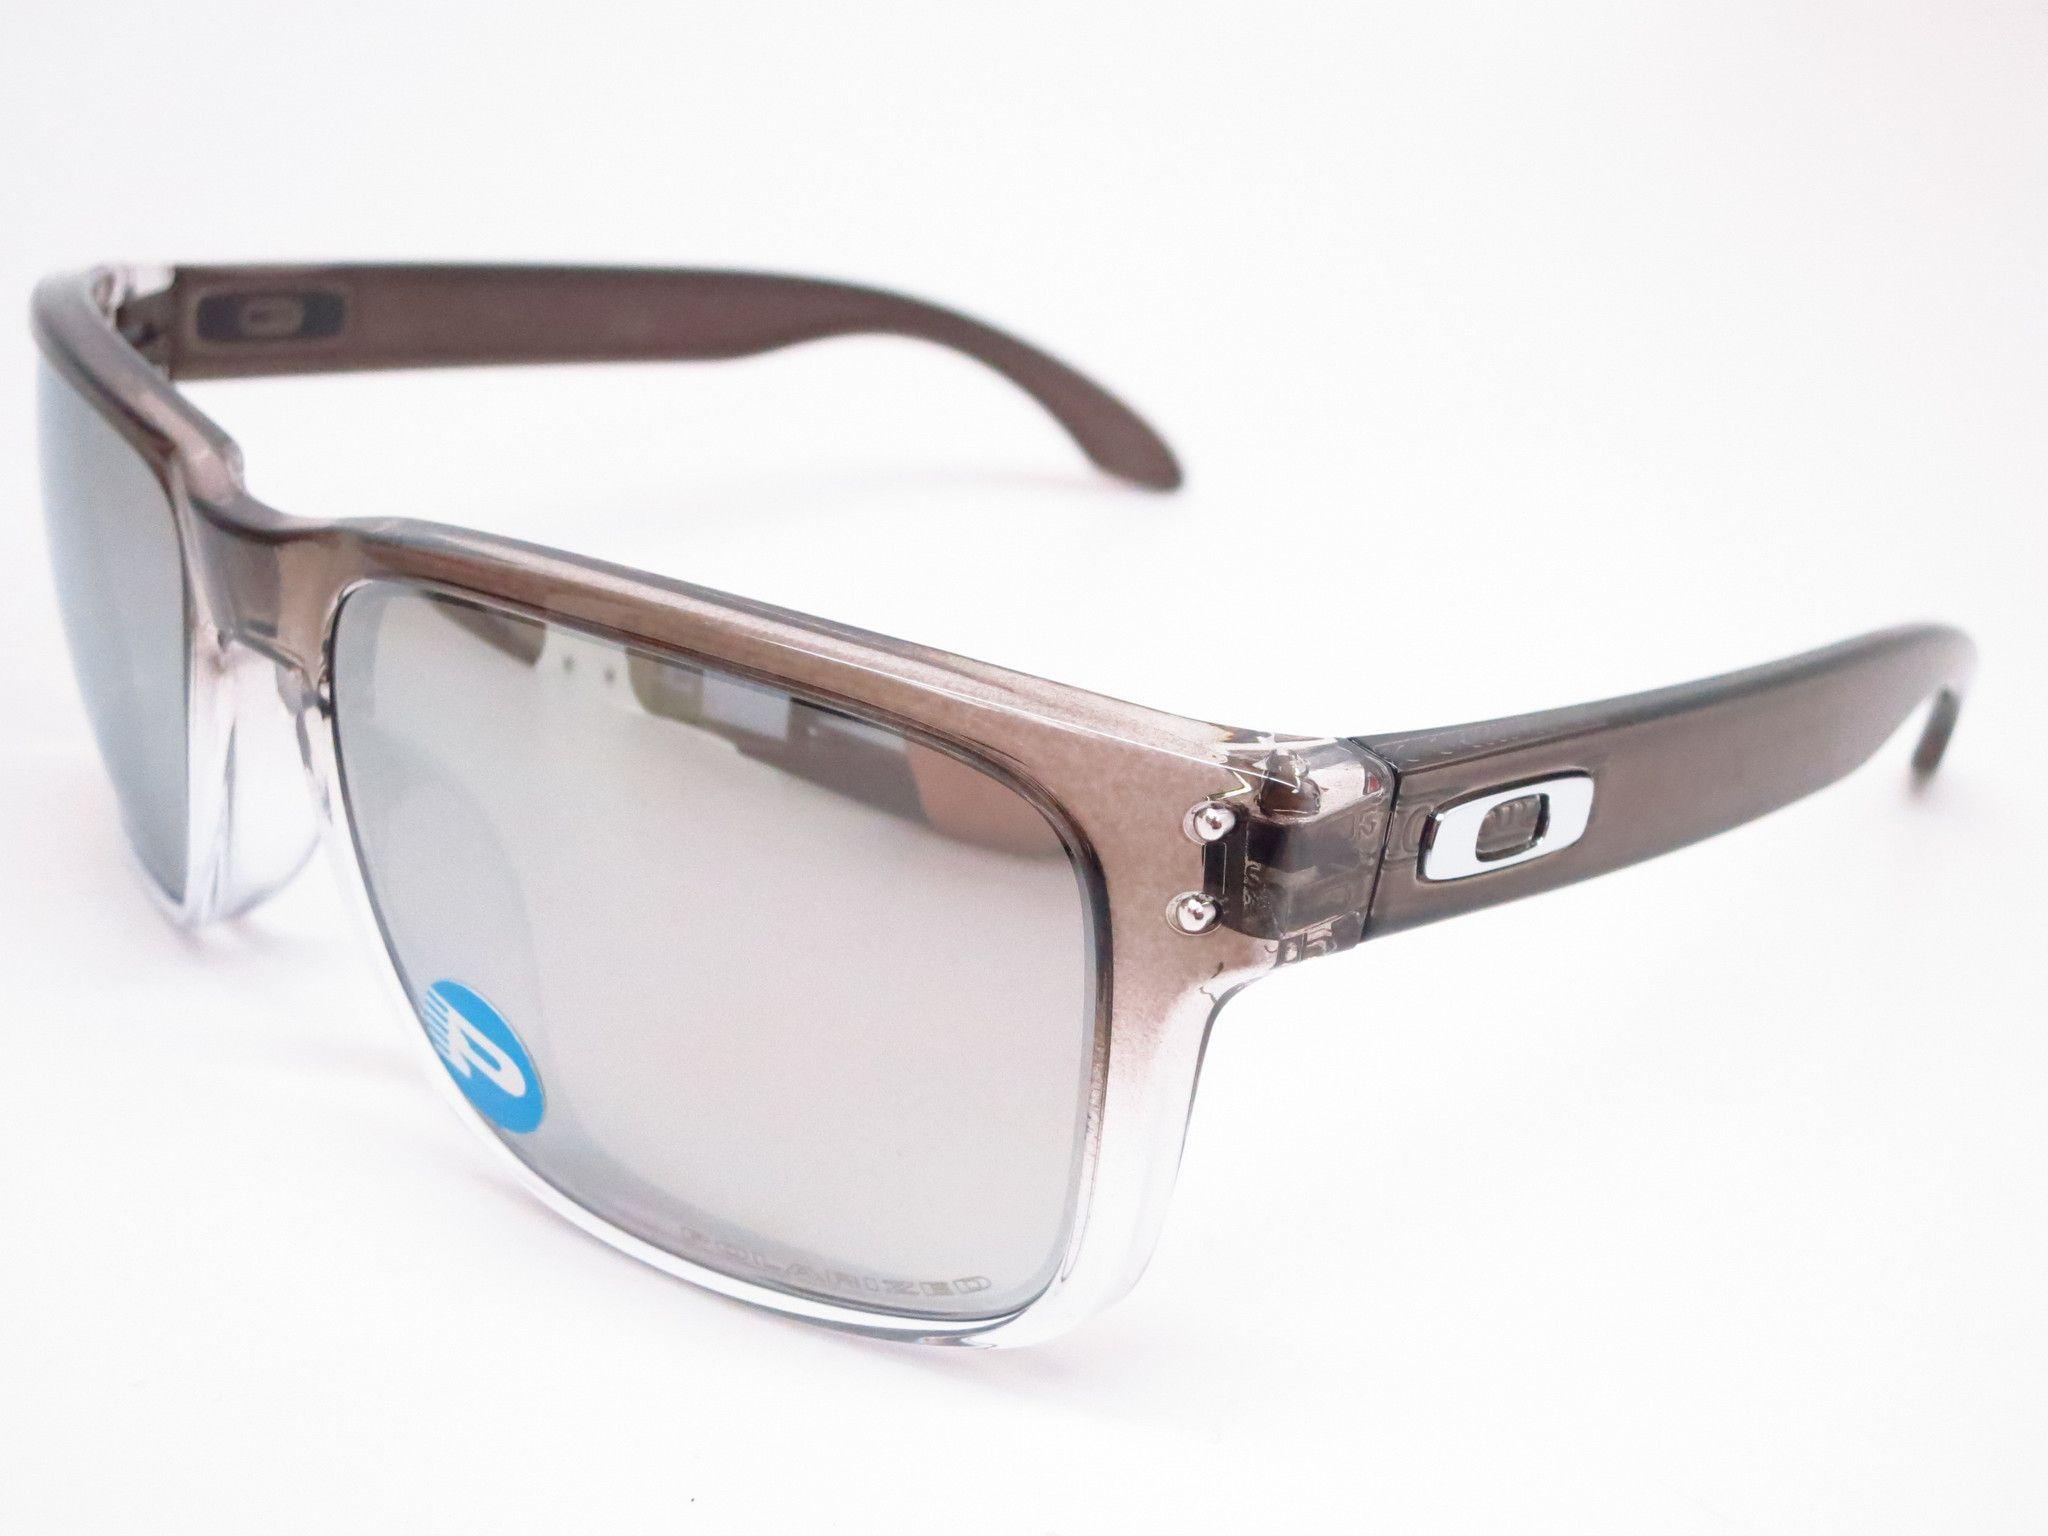 Oakley Holbrook OO9102-A9 Dark Ink Fade Polarized Sunglasses ...